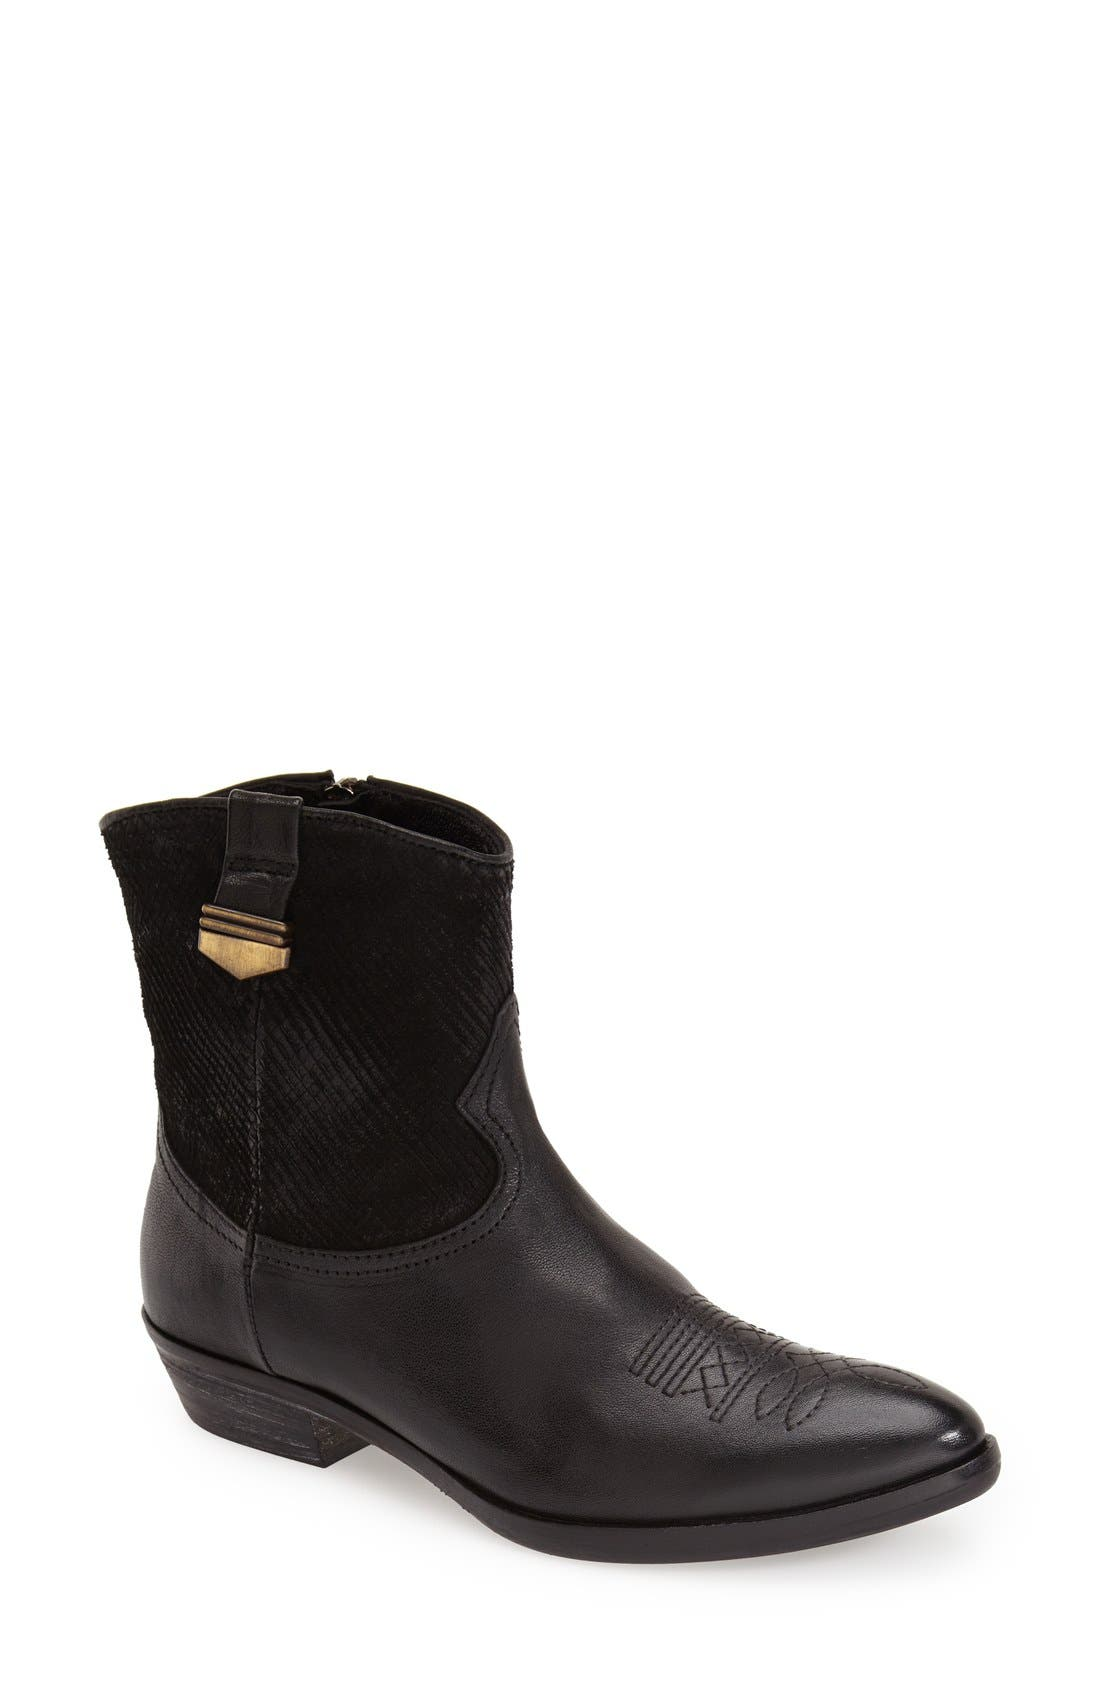 Main Image - KBR Flat Boot (Women)